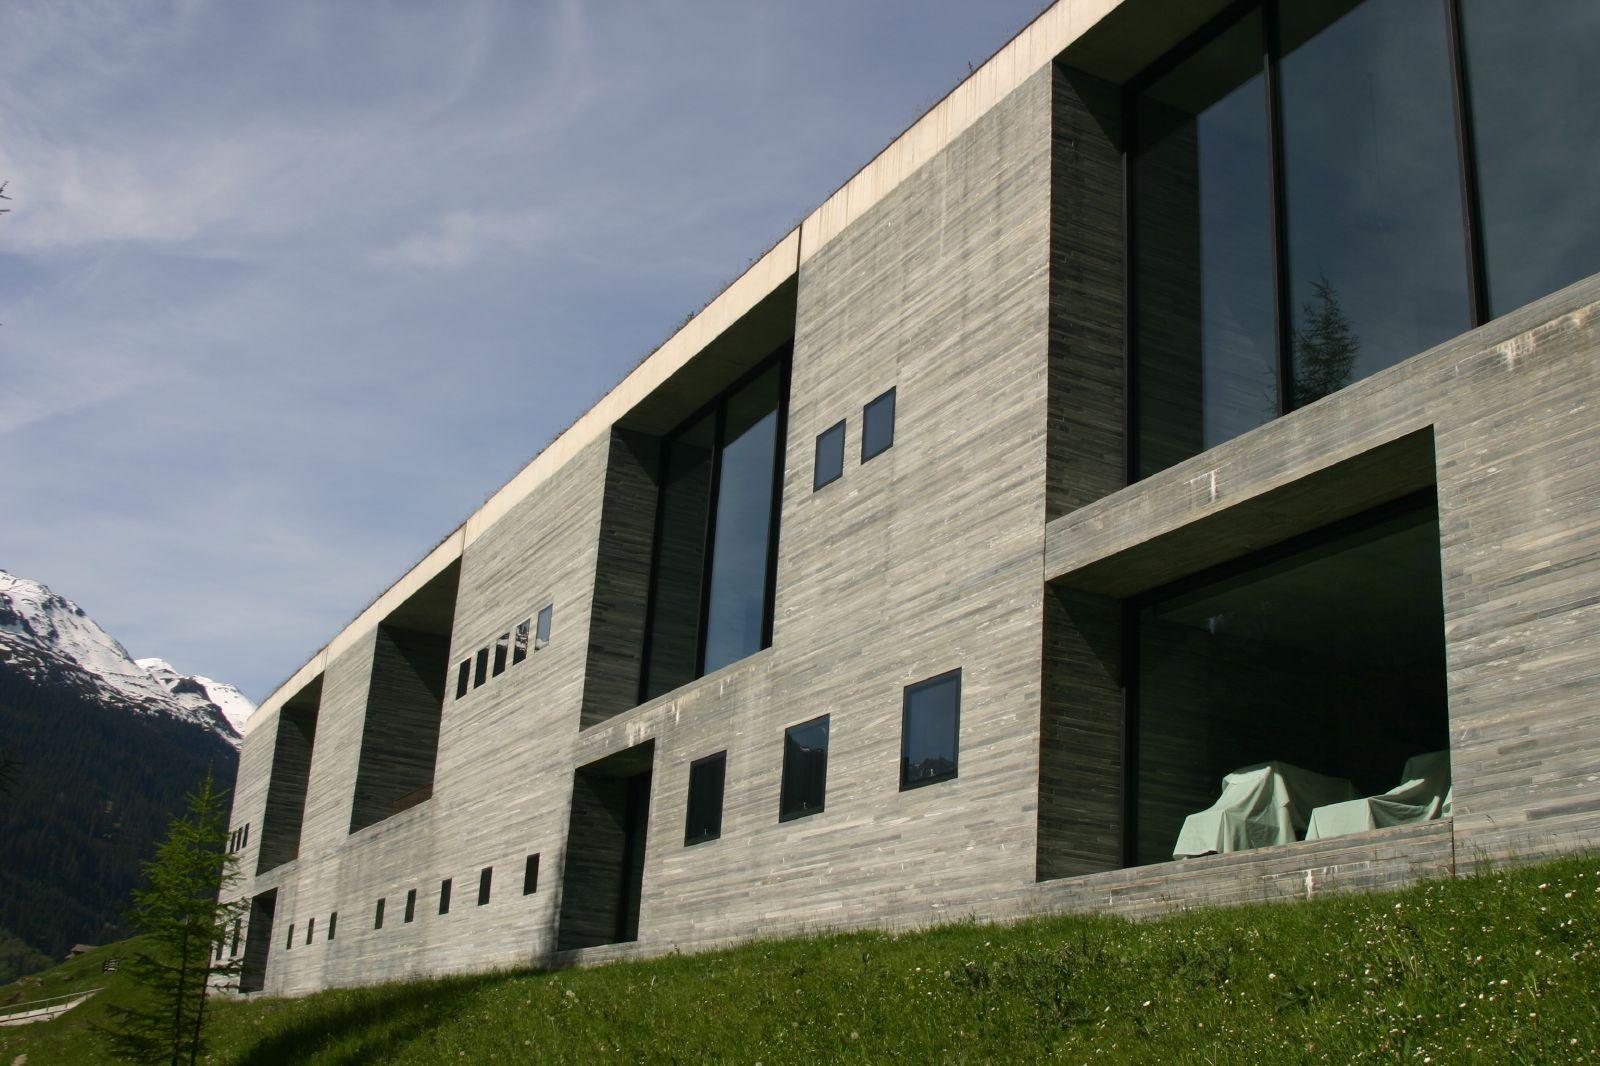 Peter zumthor las termas de vals sobrearquitecturas for Therme vals vals svizzera